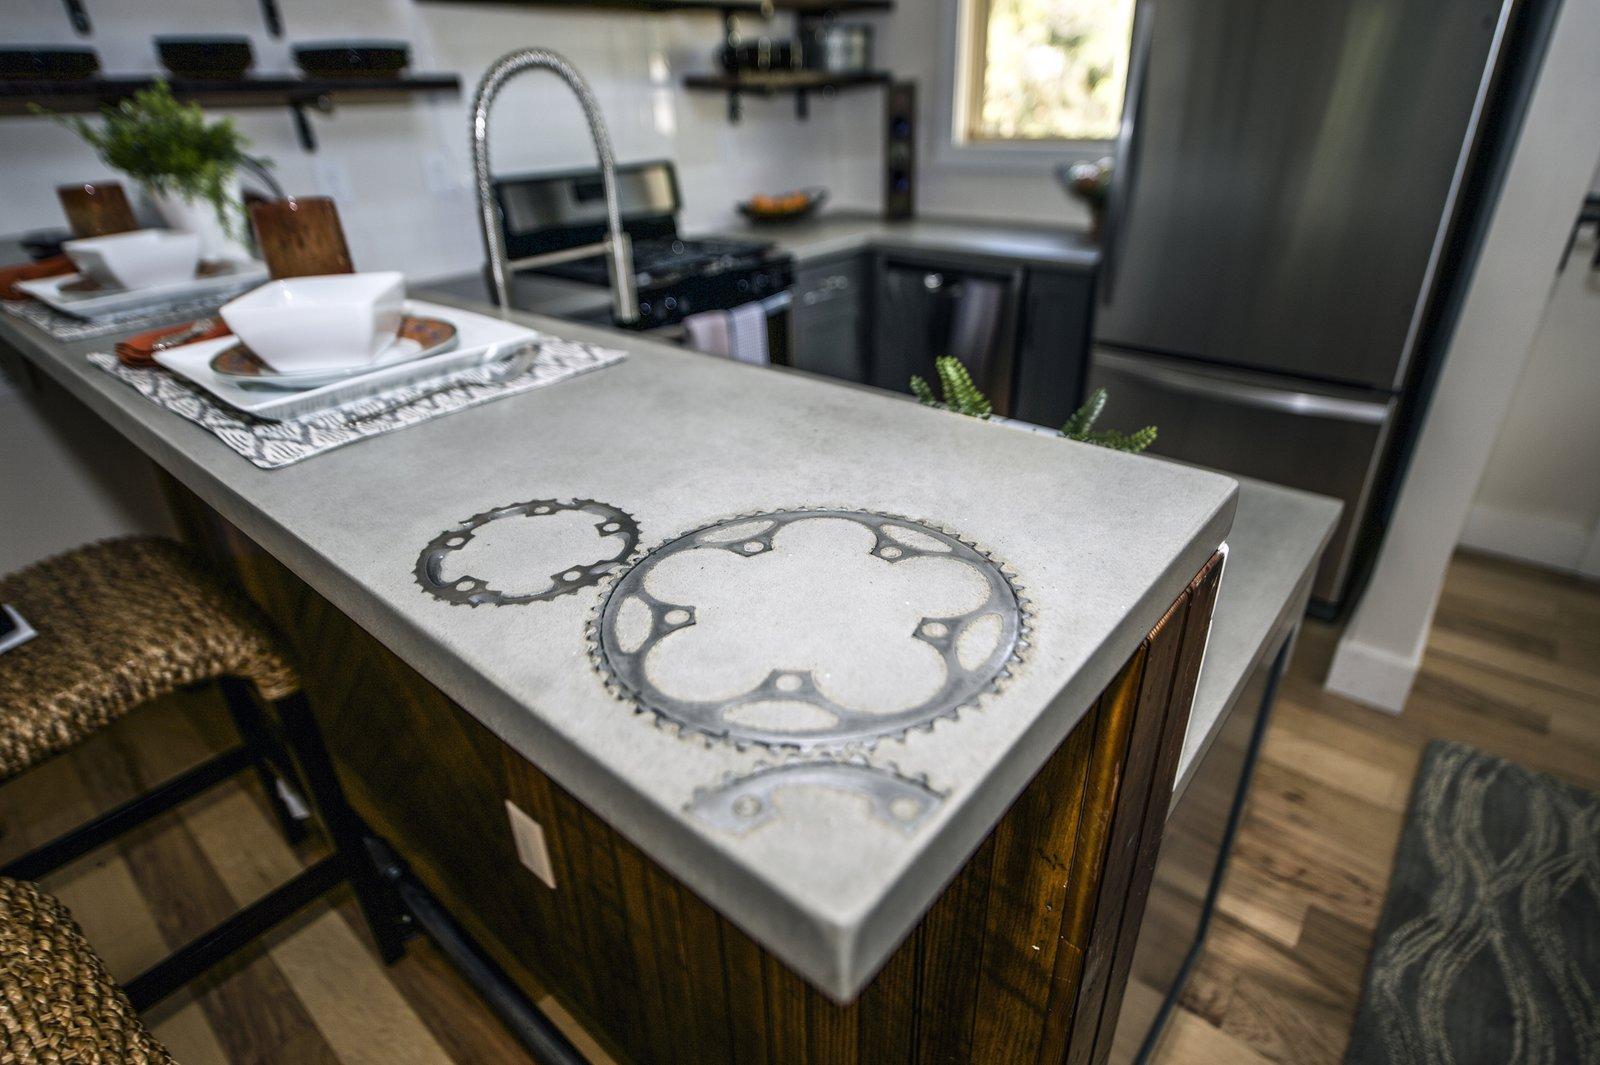 Urban Micro Home kitchen countertop